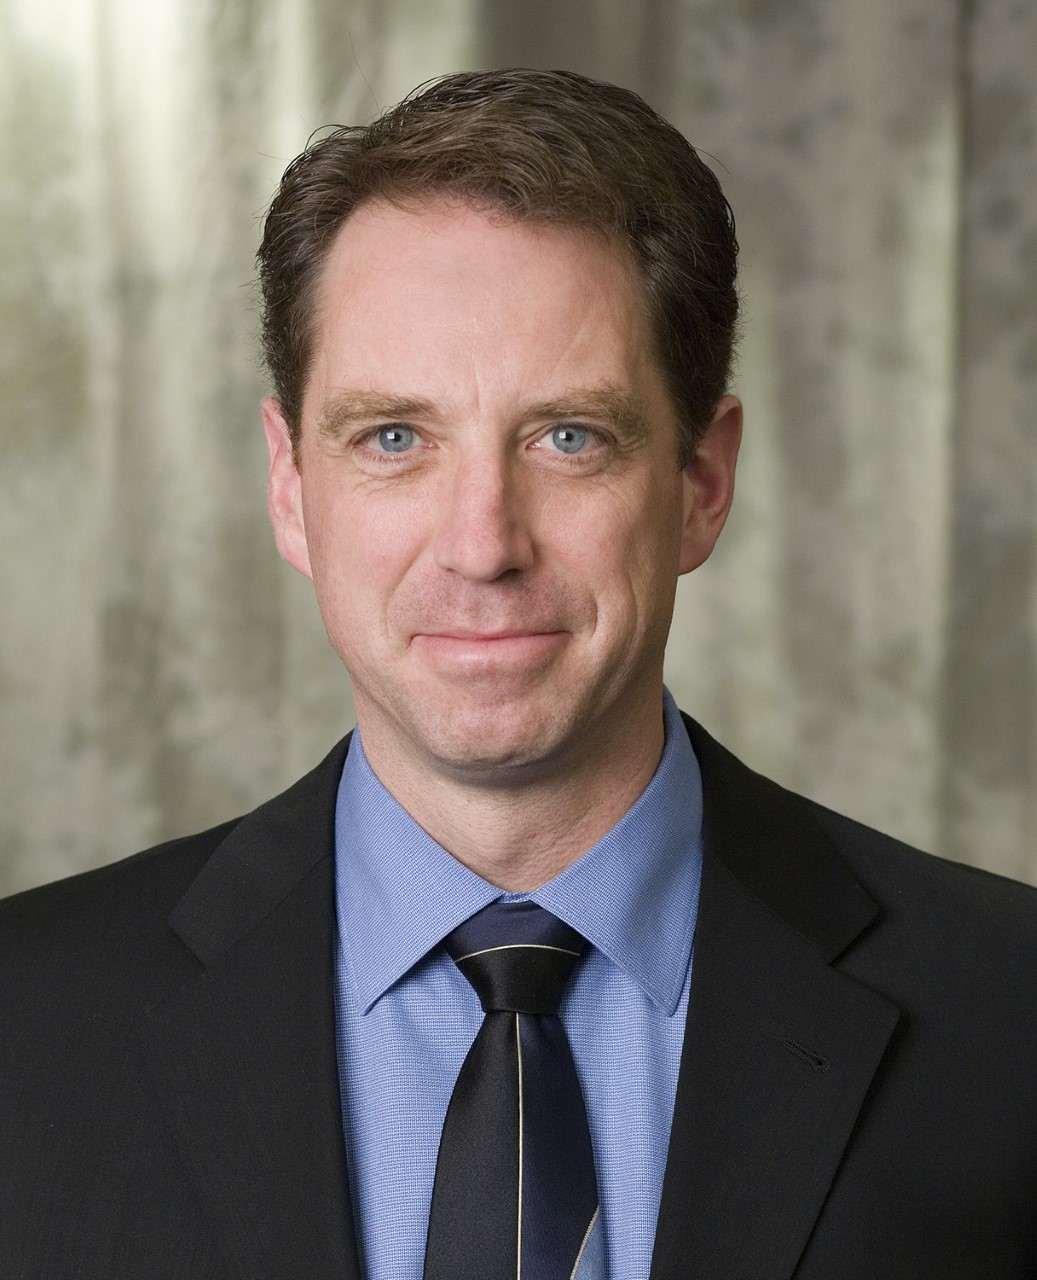 Keith Palmer